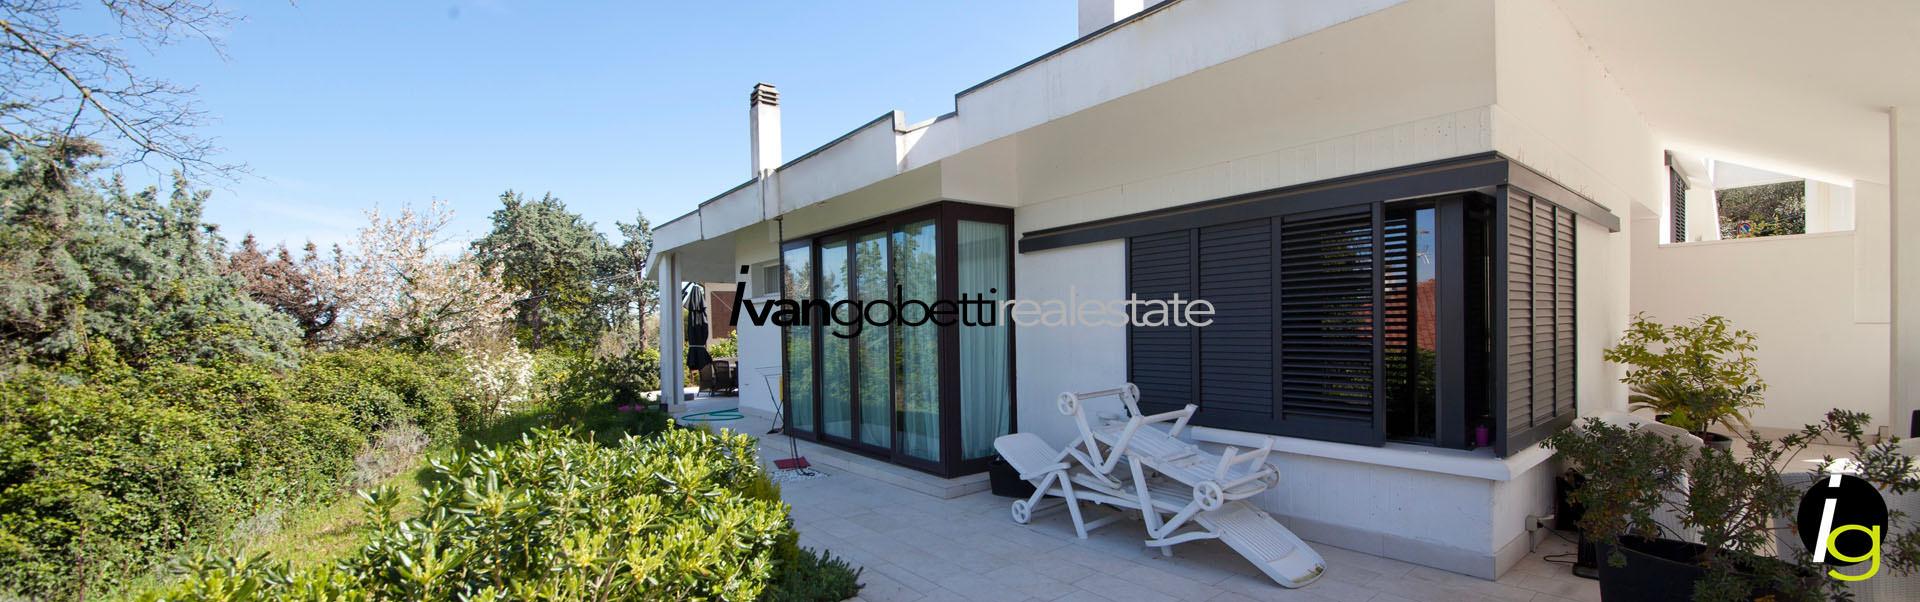 Villa moderna con piscina e SPA a Rimini